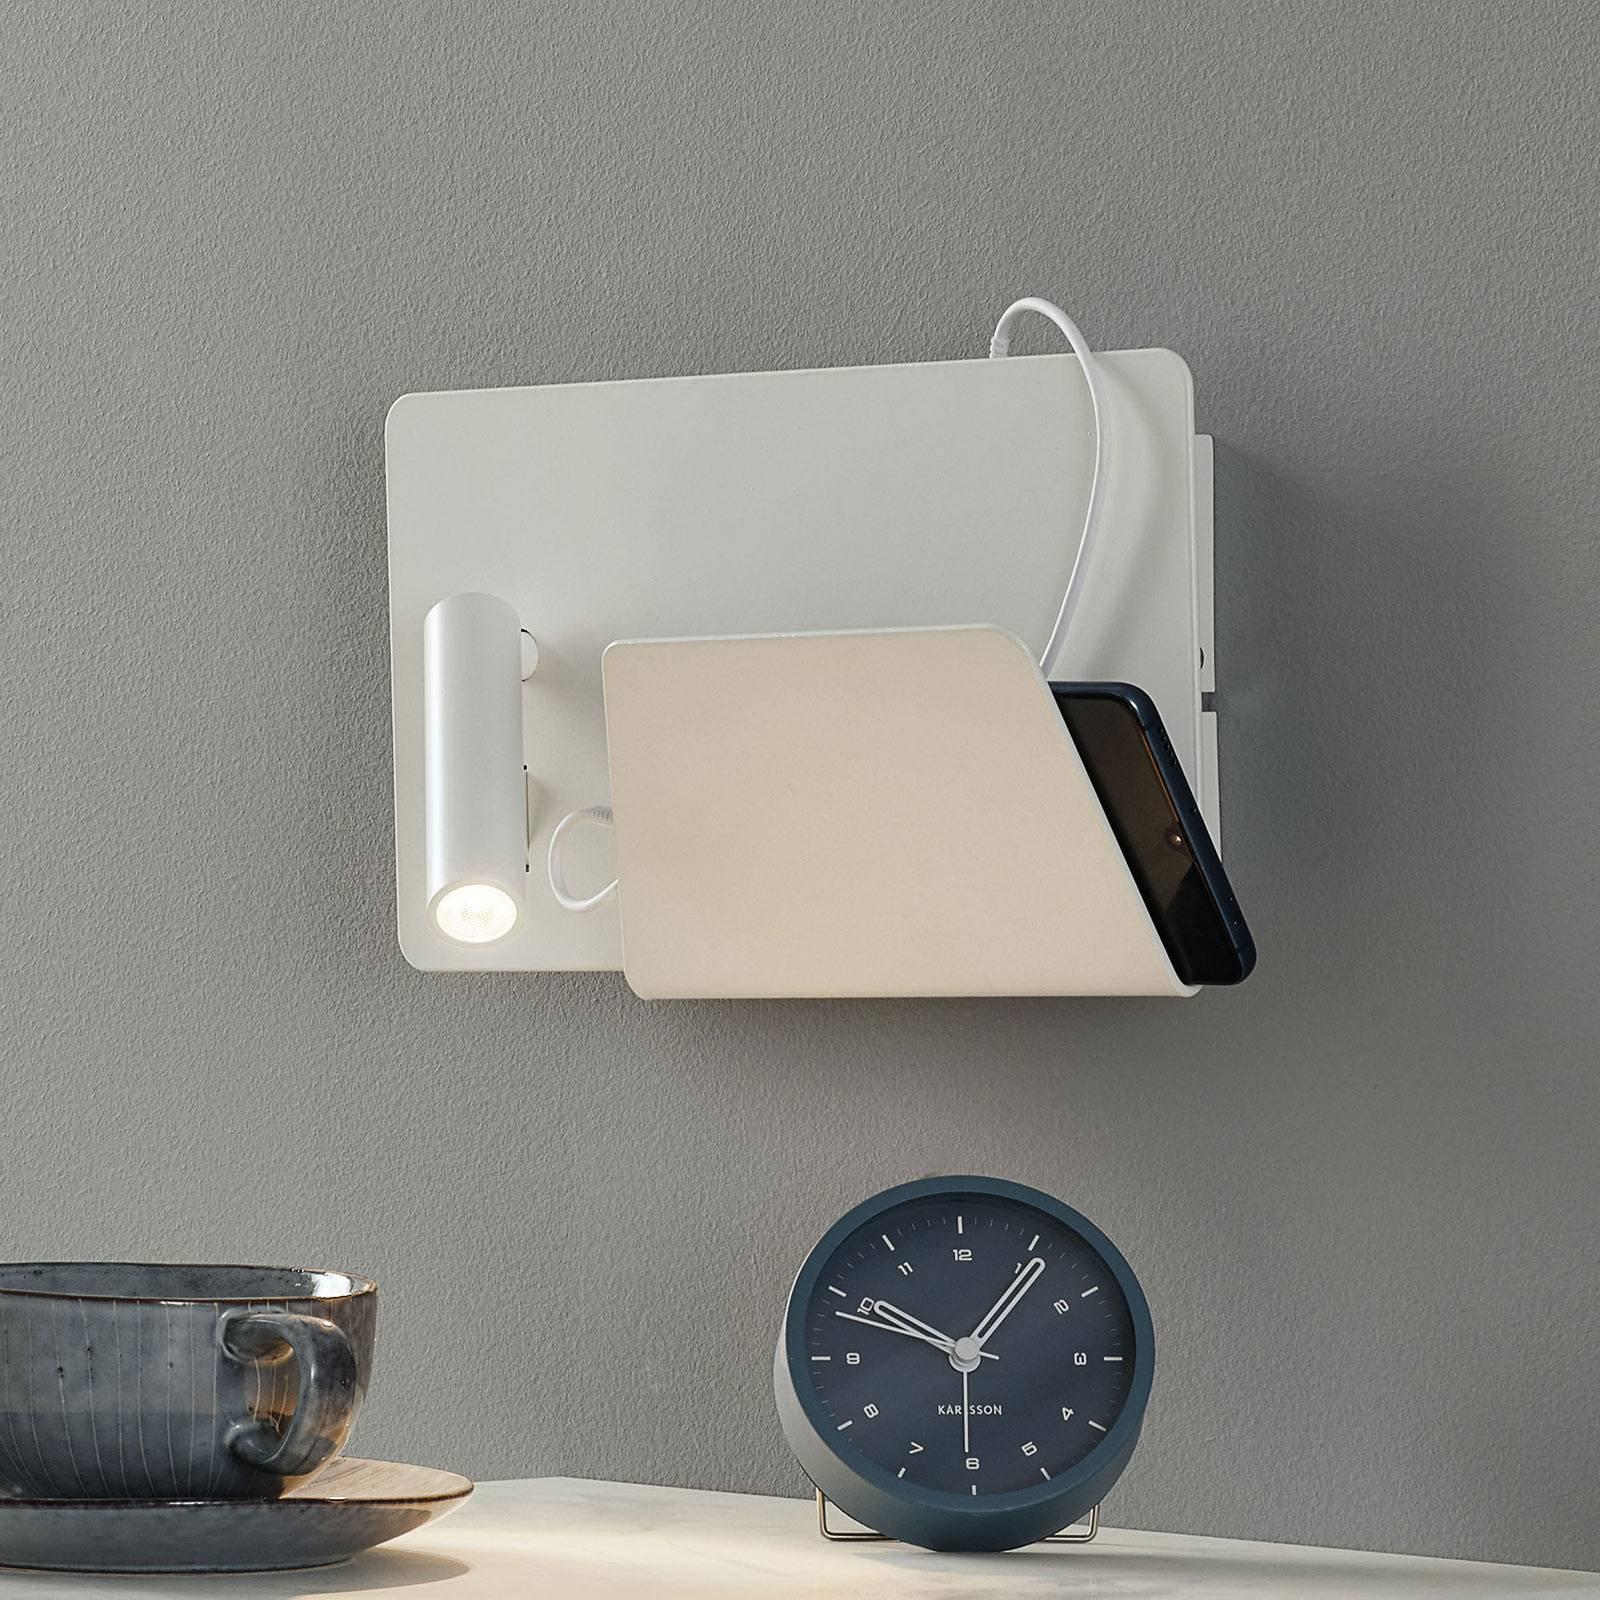 Moderne LED-vegglampe Suau med USB-ladetilkobling